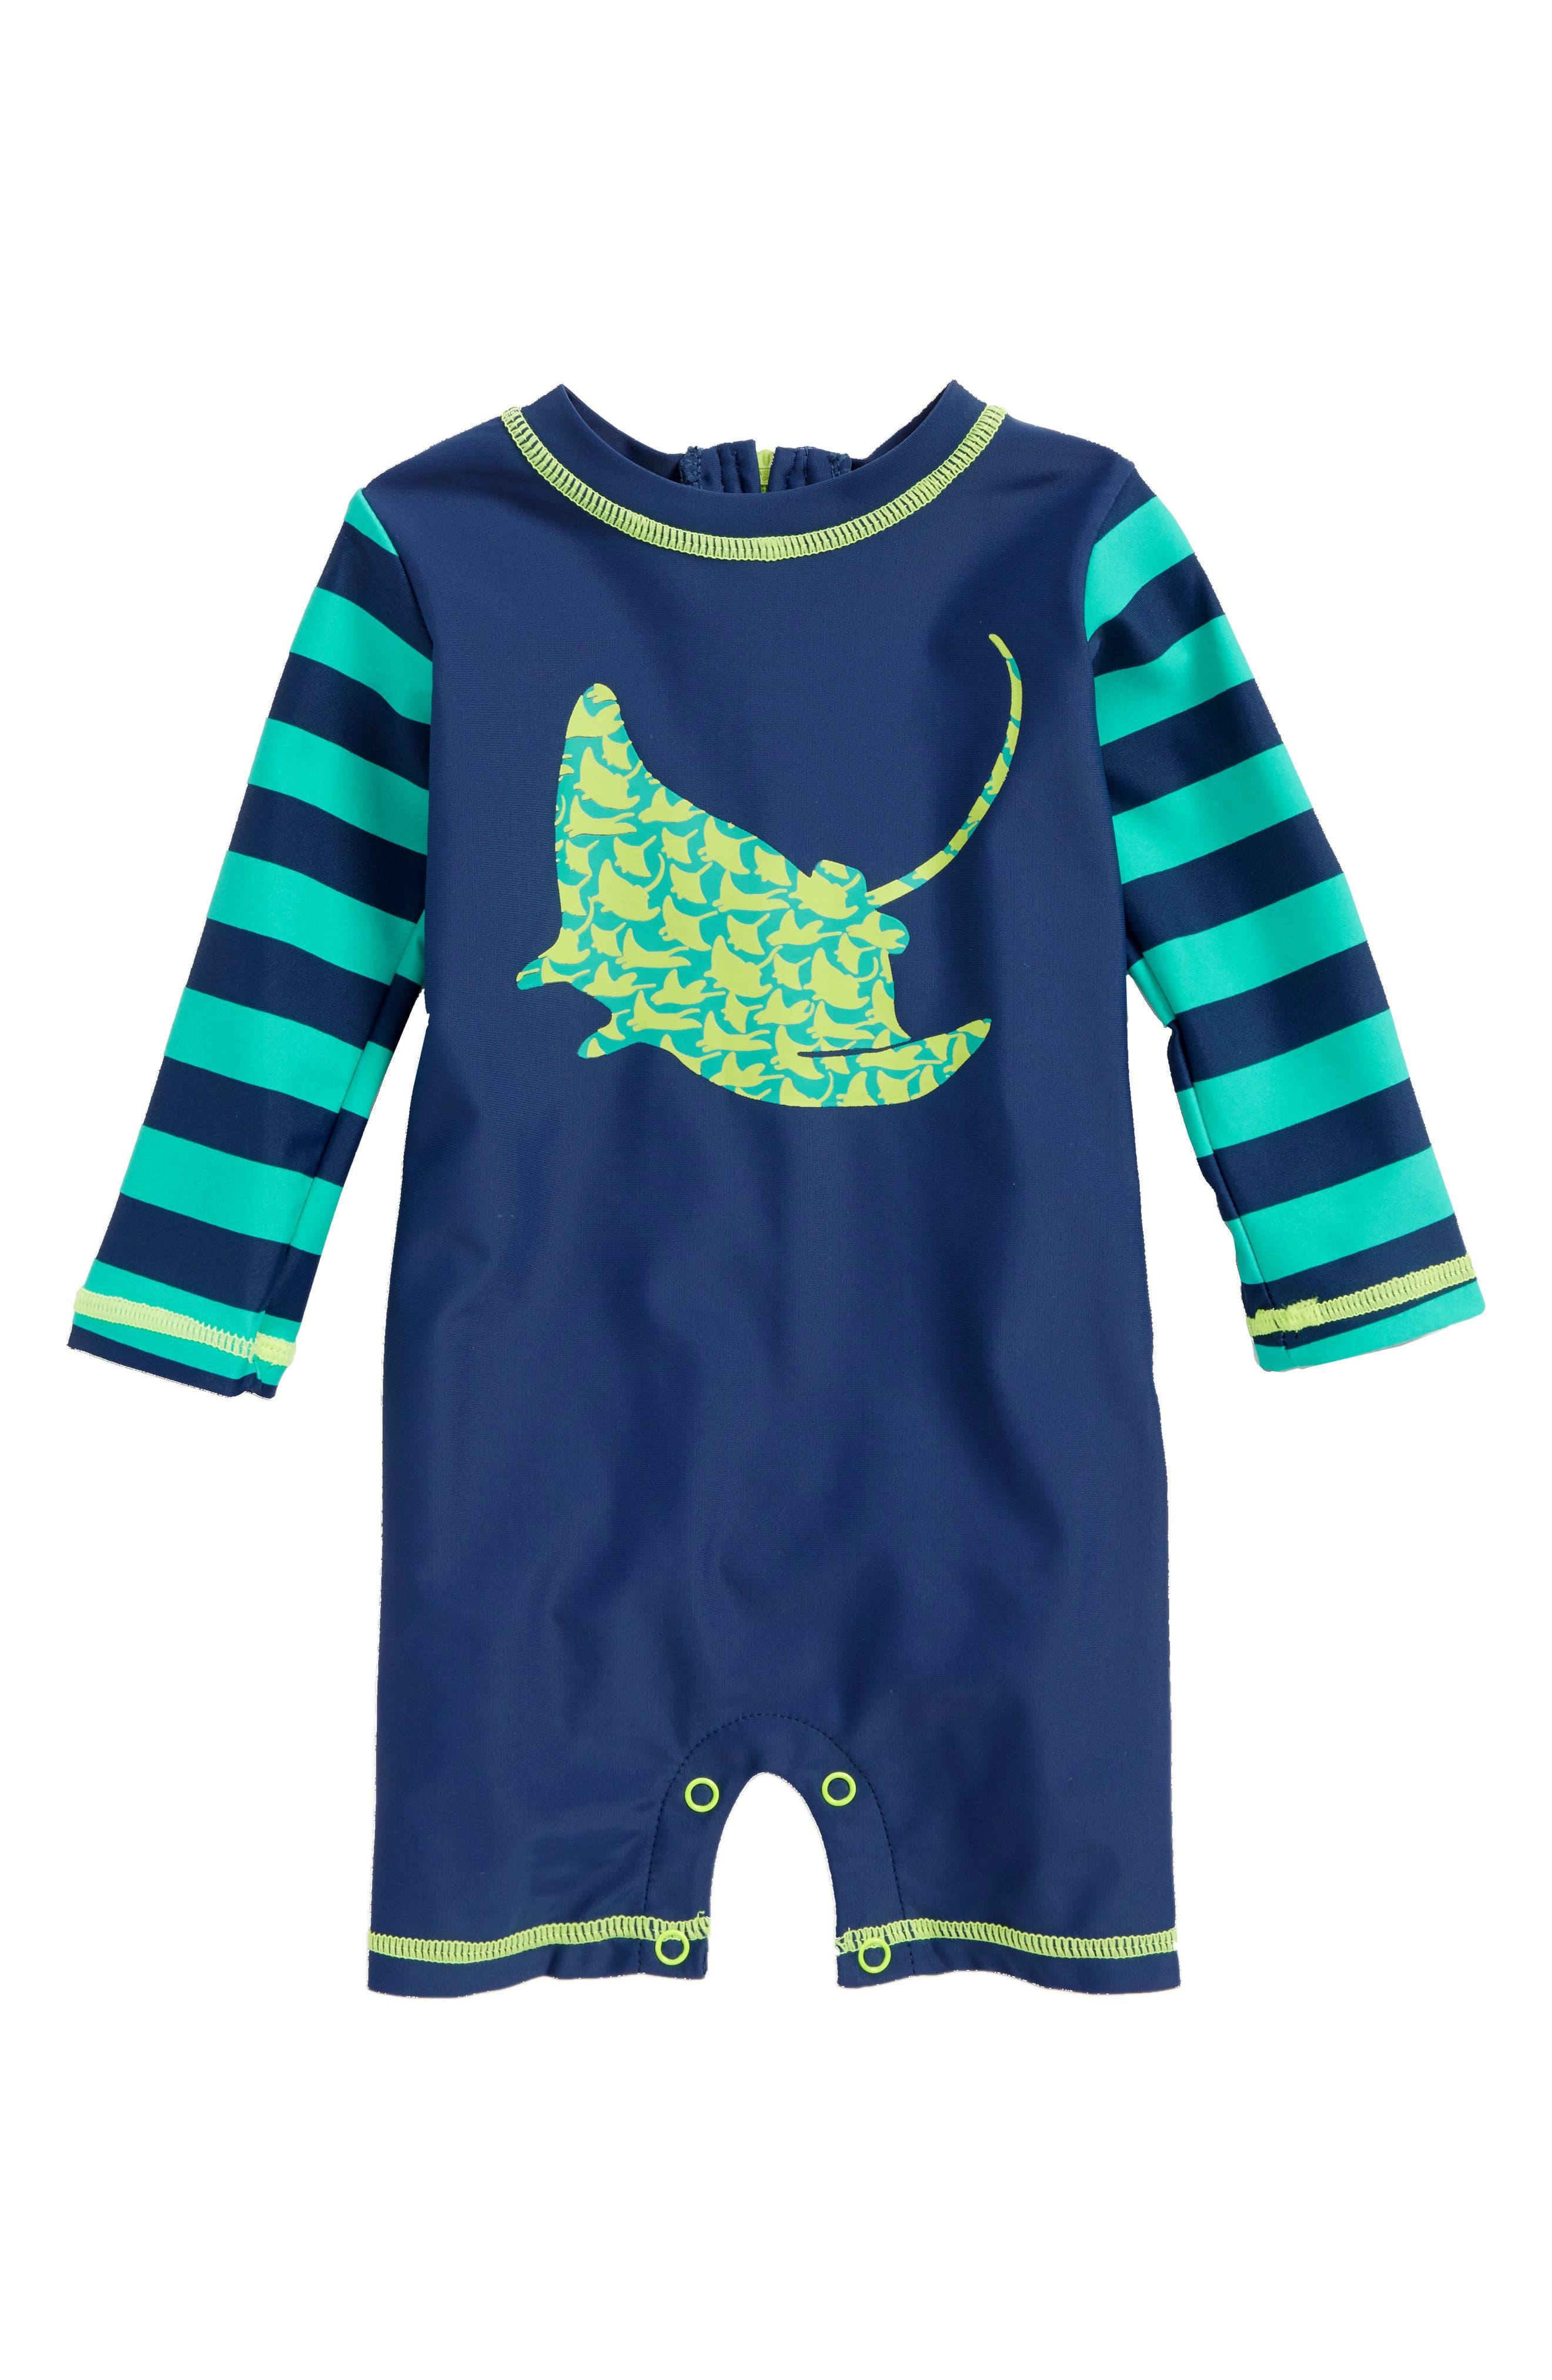 Alternate Image 1 Selected - Hatley One-Piece Rashguard Swimsuit (Baby Boys)